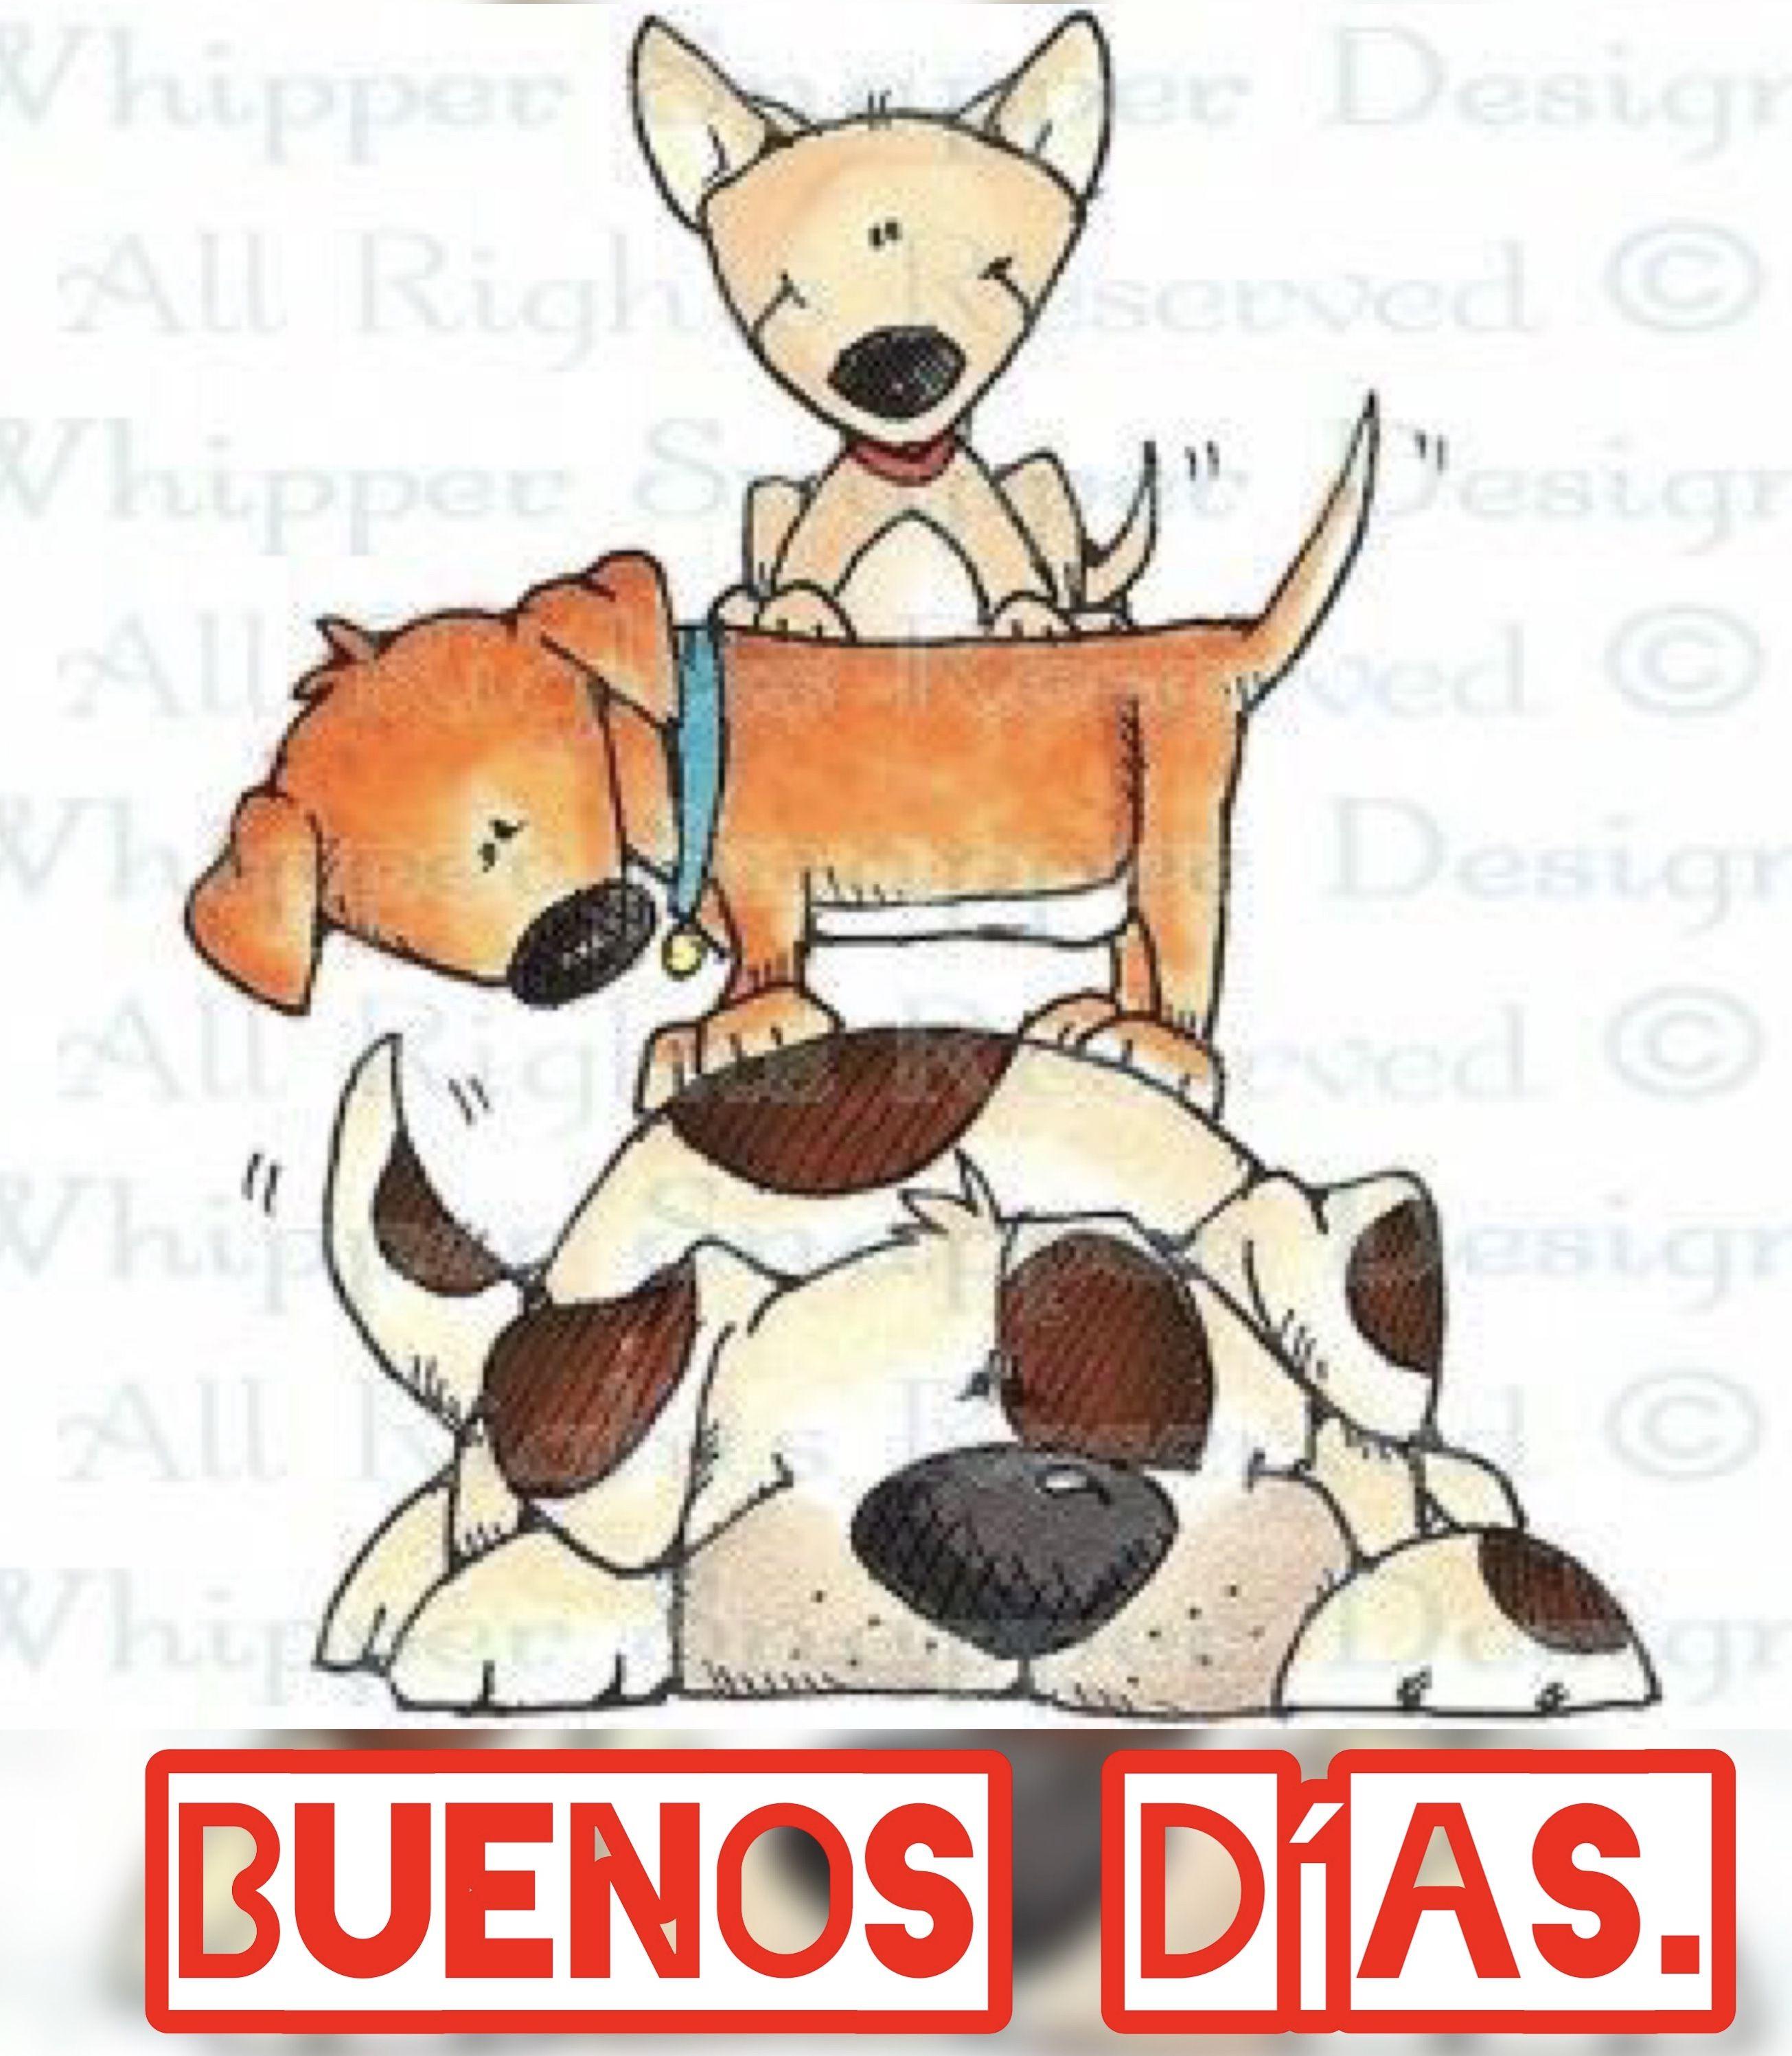 Buenos Dias Dibujo De Perro Dibujos De Animales Dibujos Bonitos